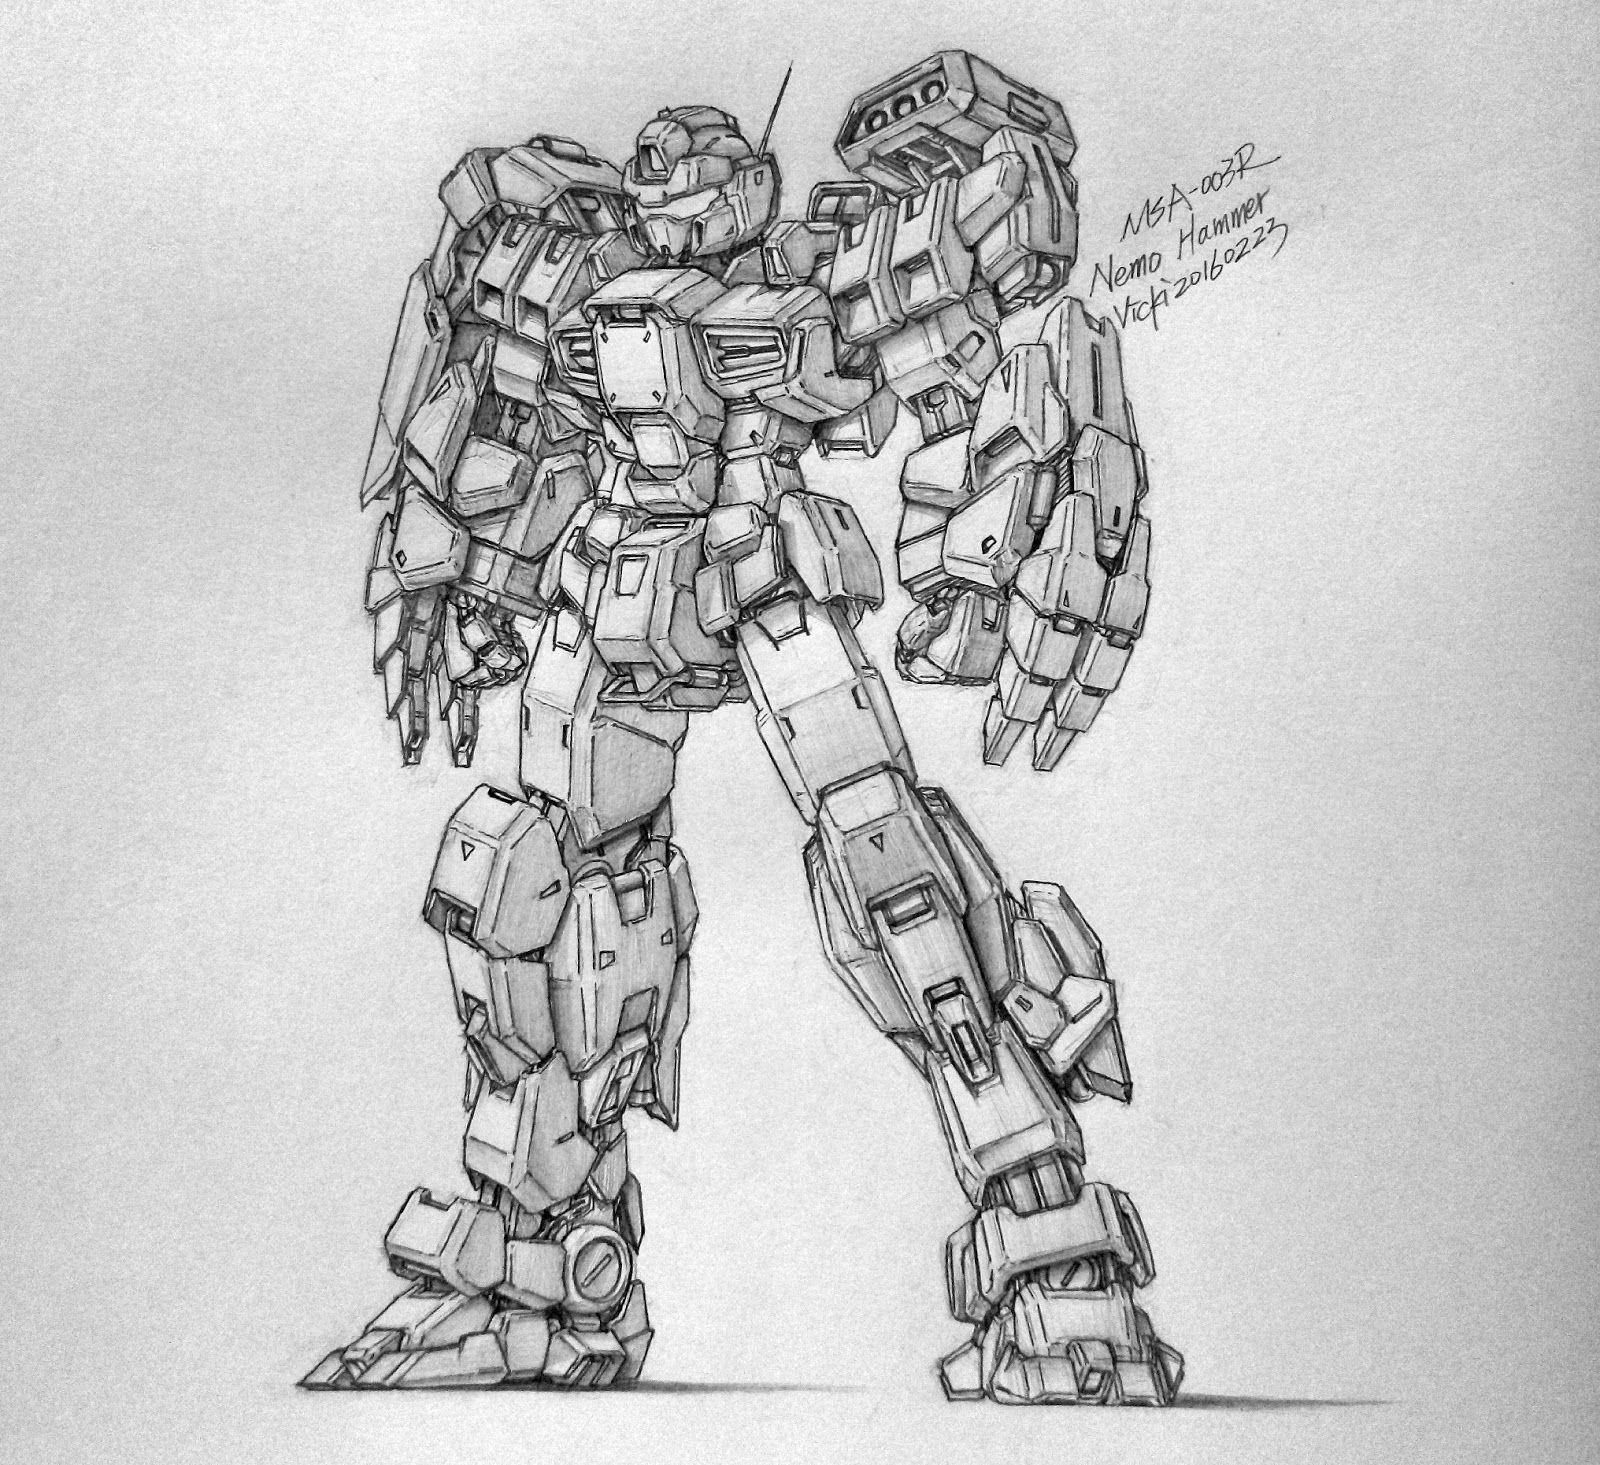 Gundam Guy Awesome Gundam Sketches By Vickidrawing Updated 4 30 16